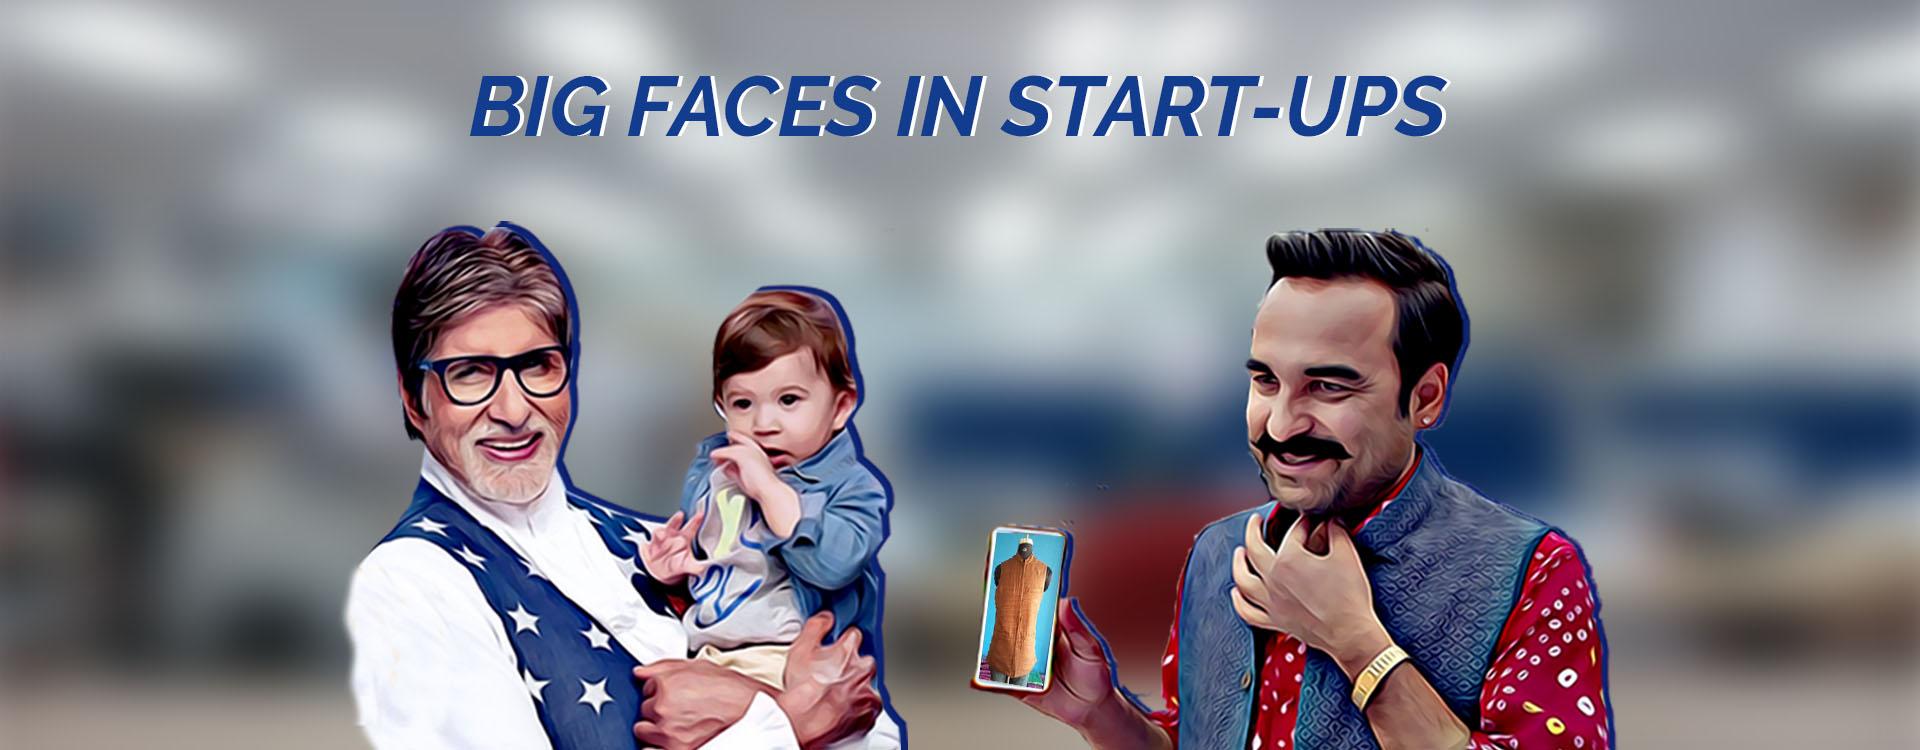 Amitabh Bachchan, Pankaj Tripathi endorsing Start-ups: How to afford a celebrity for business branding?